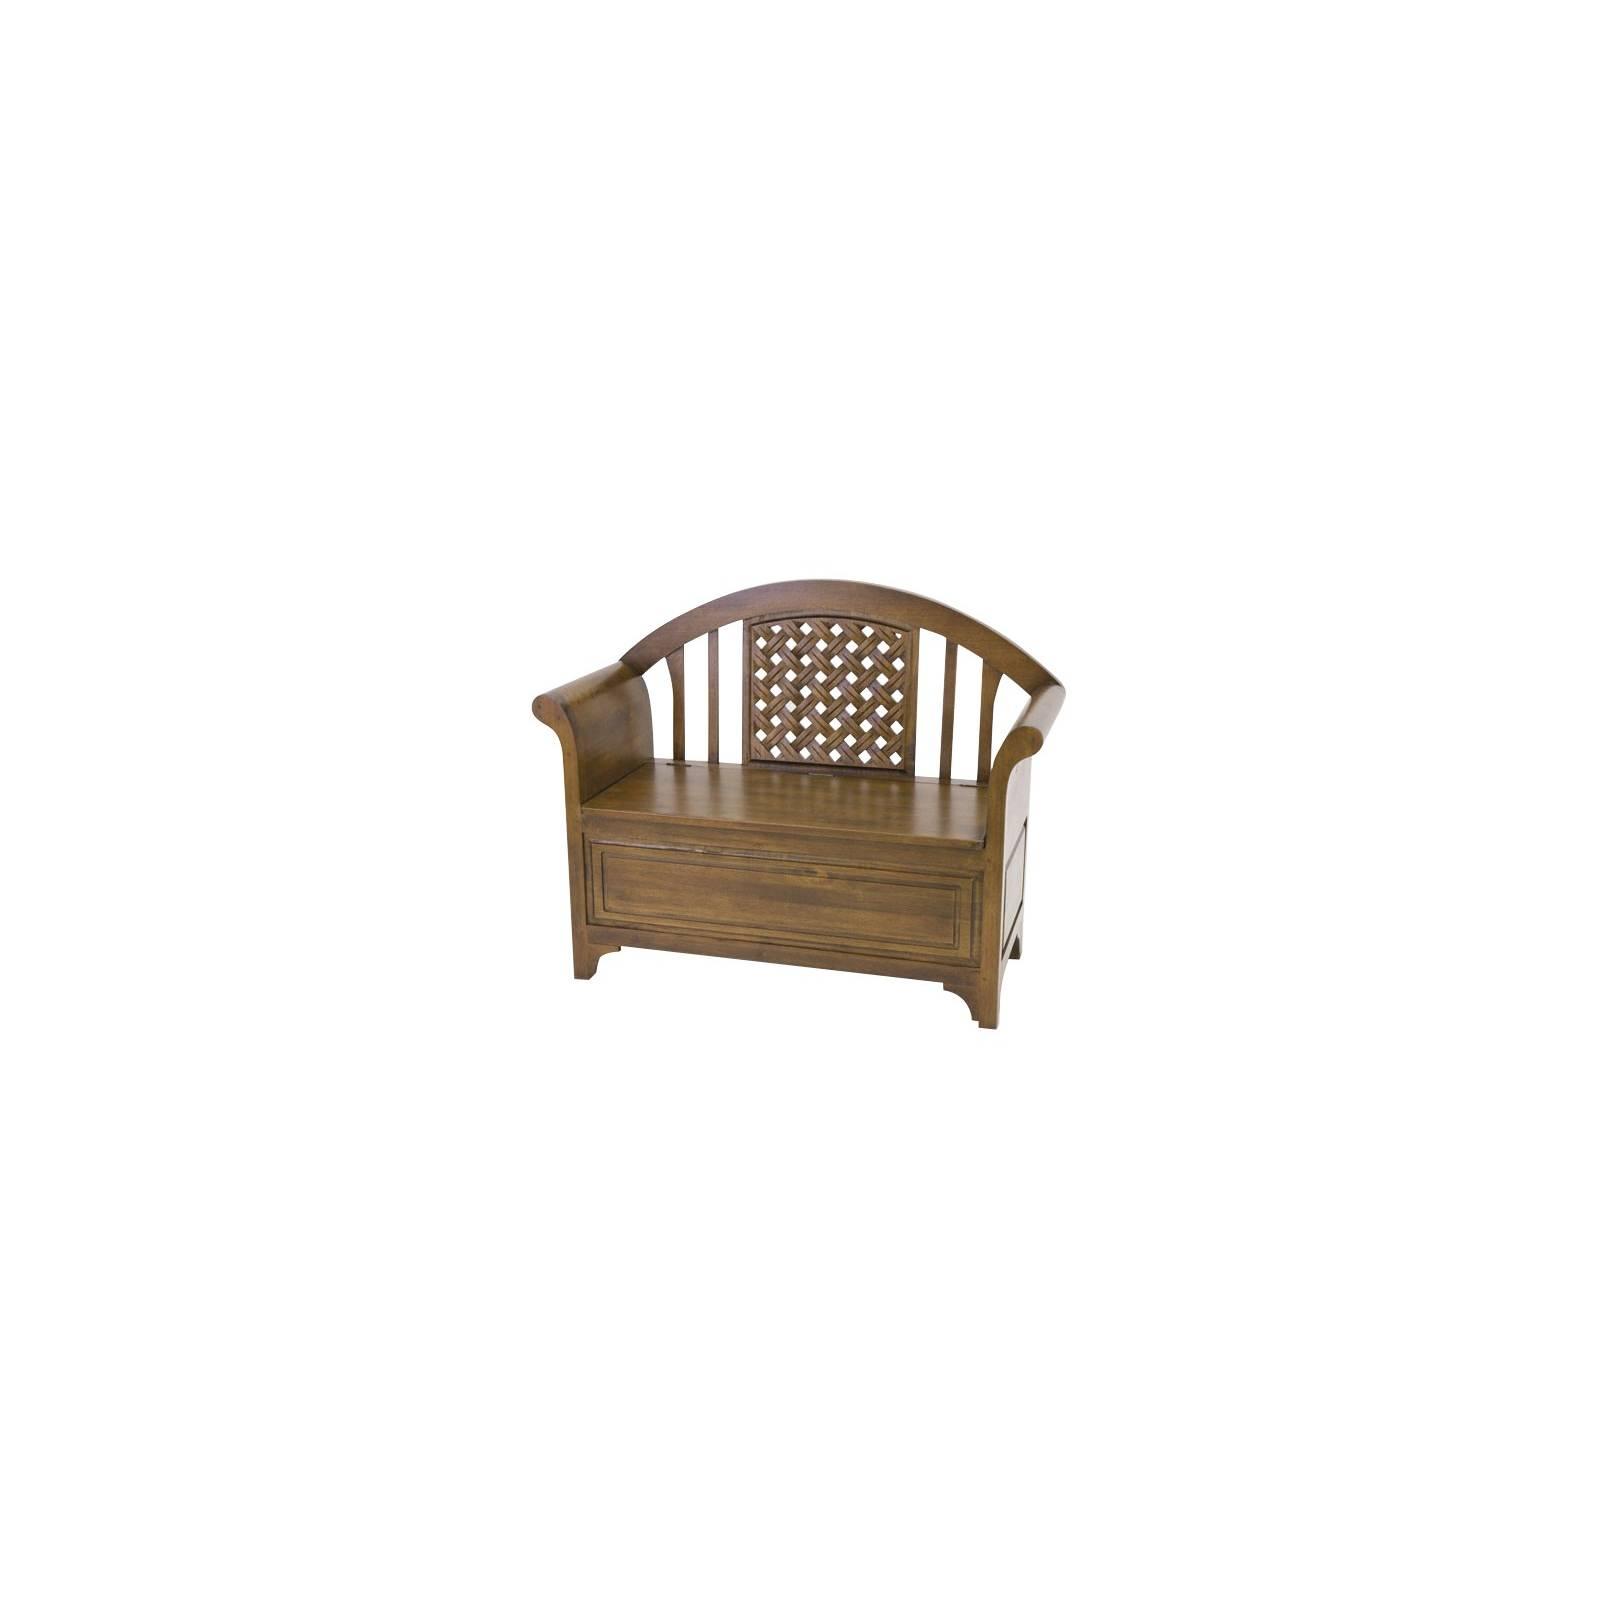 Fauteuil Coffre Panama Hévéa - meuble bois massif